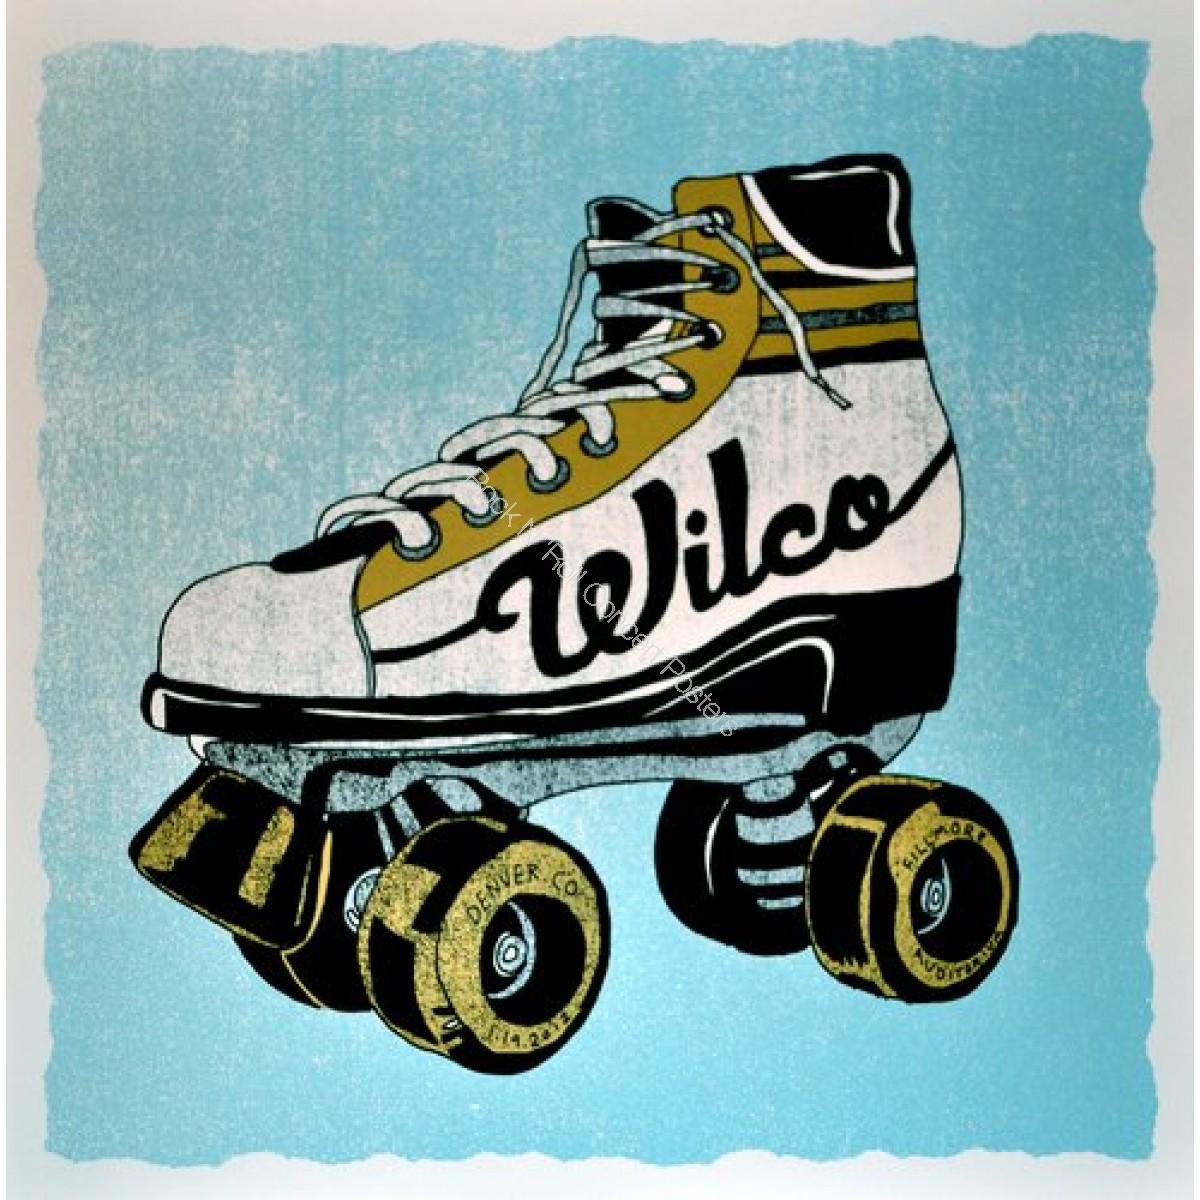 Wilco @ The Denver Fillmore 1/19/11 official screen print LE of 150